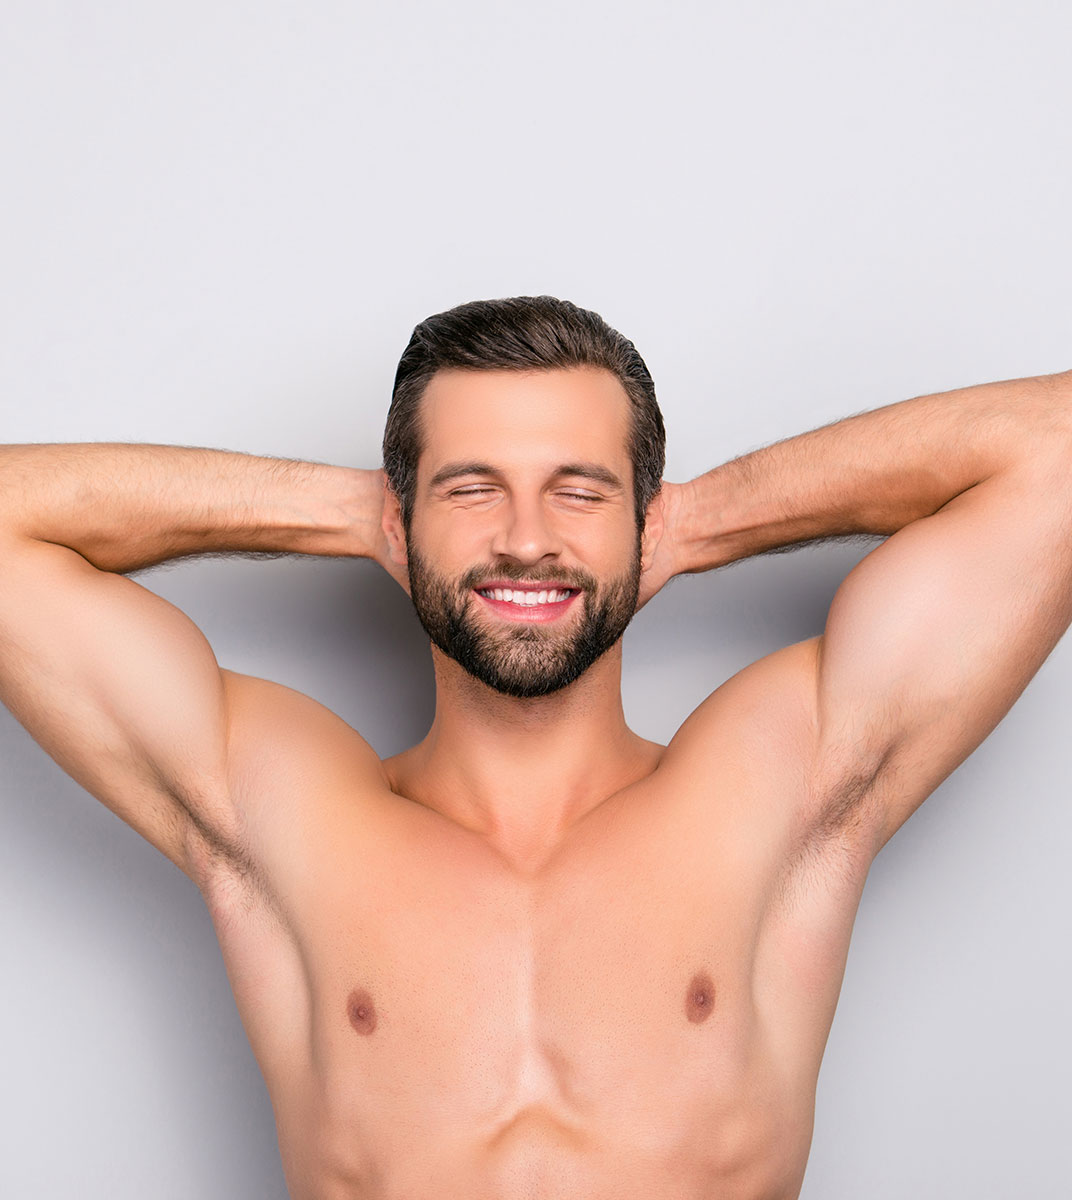 Männer Schönheitsoperation